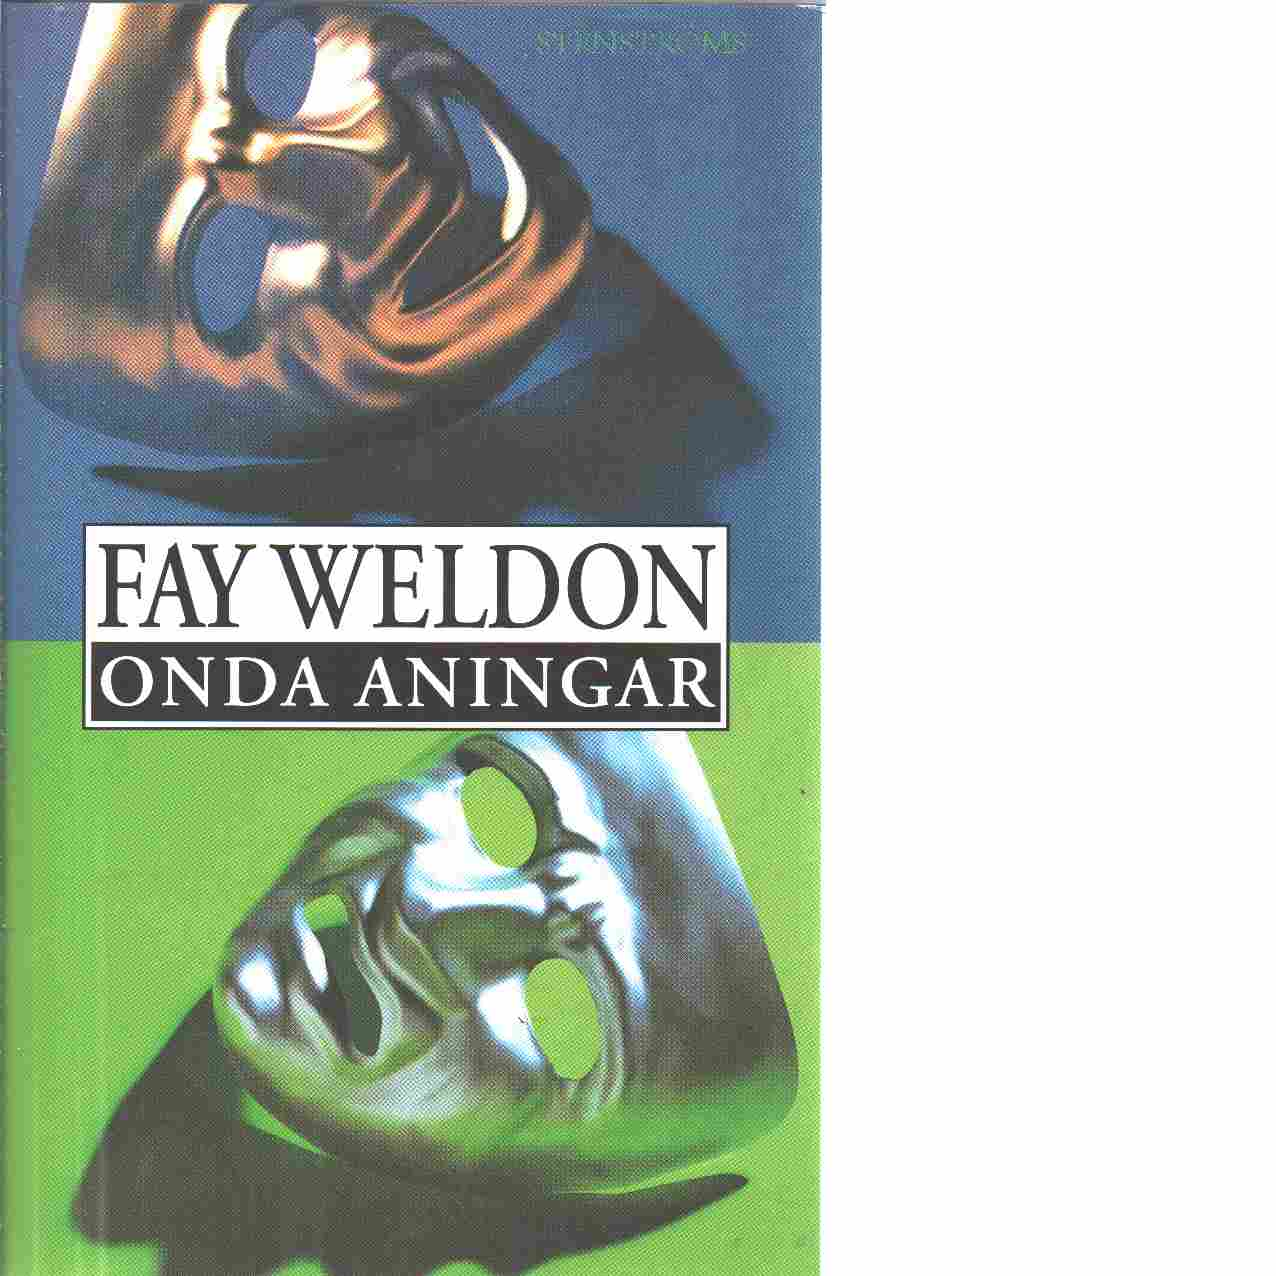 Onda aningar - Weldon, Fay